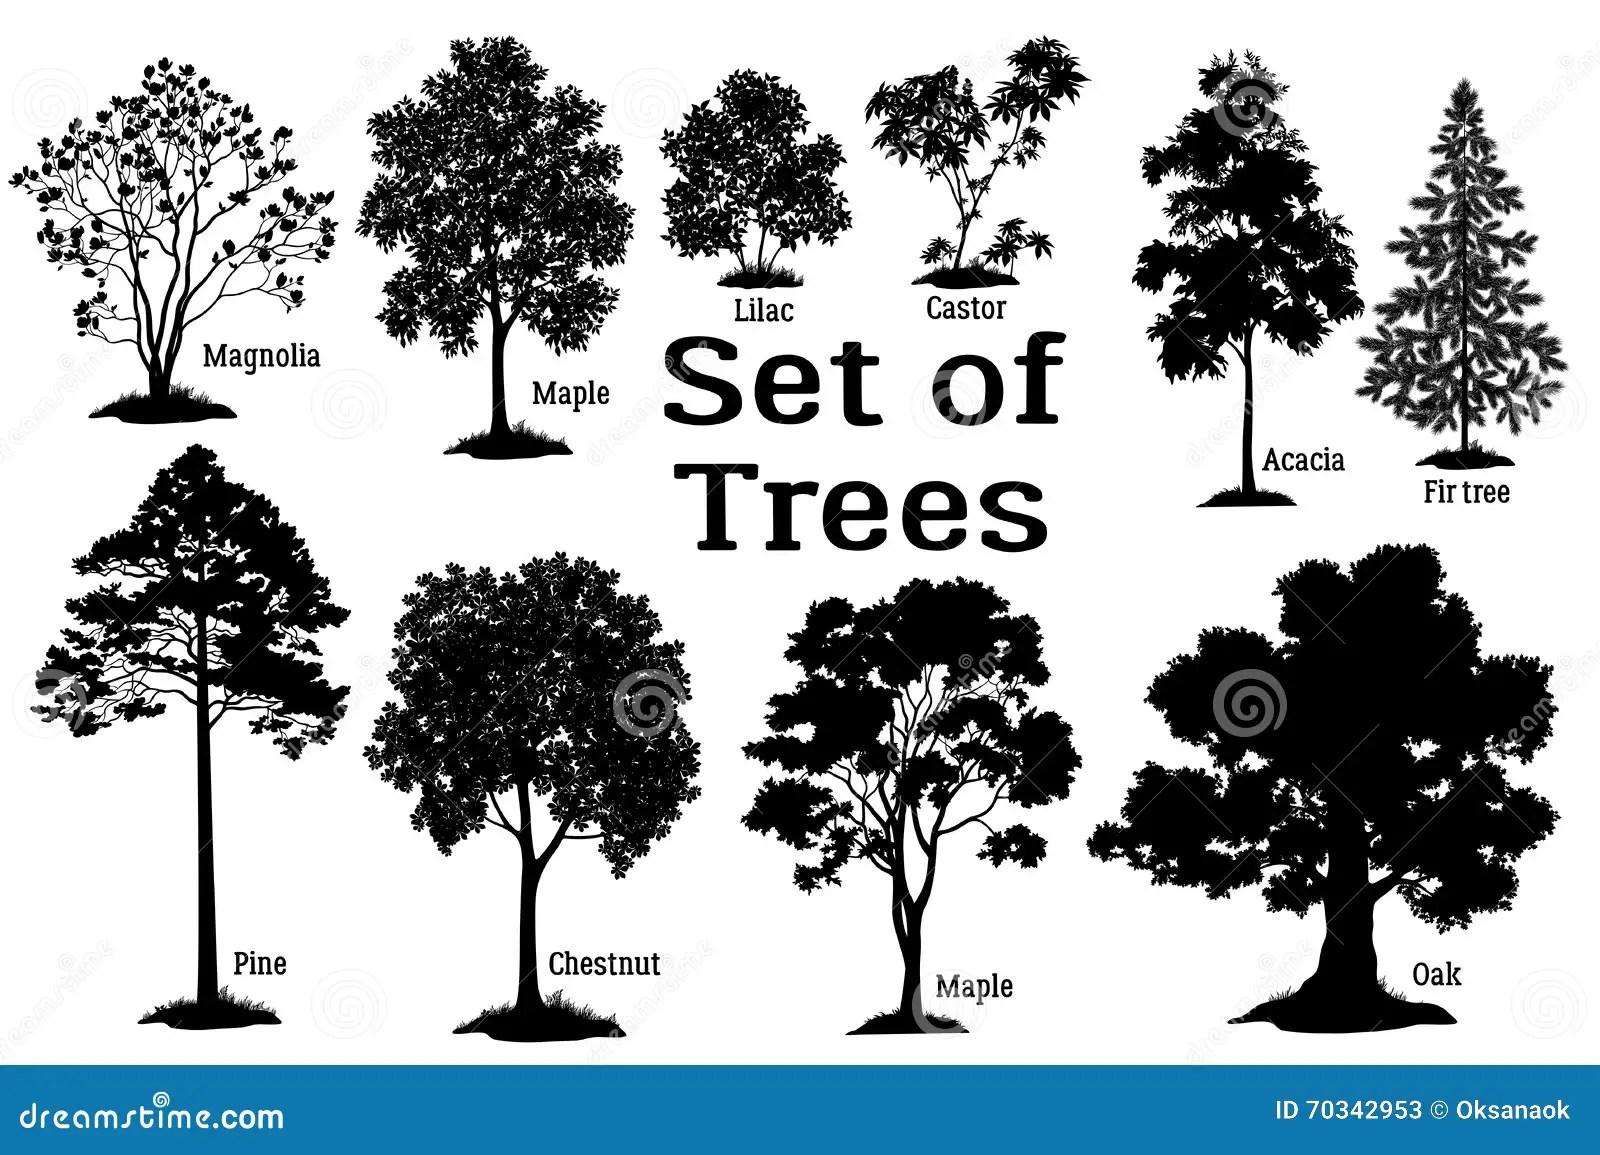 Pine Tree Black Silhouette Stock Vector Illustration Of